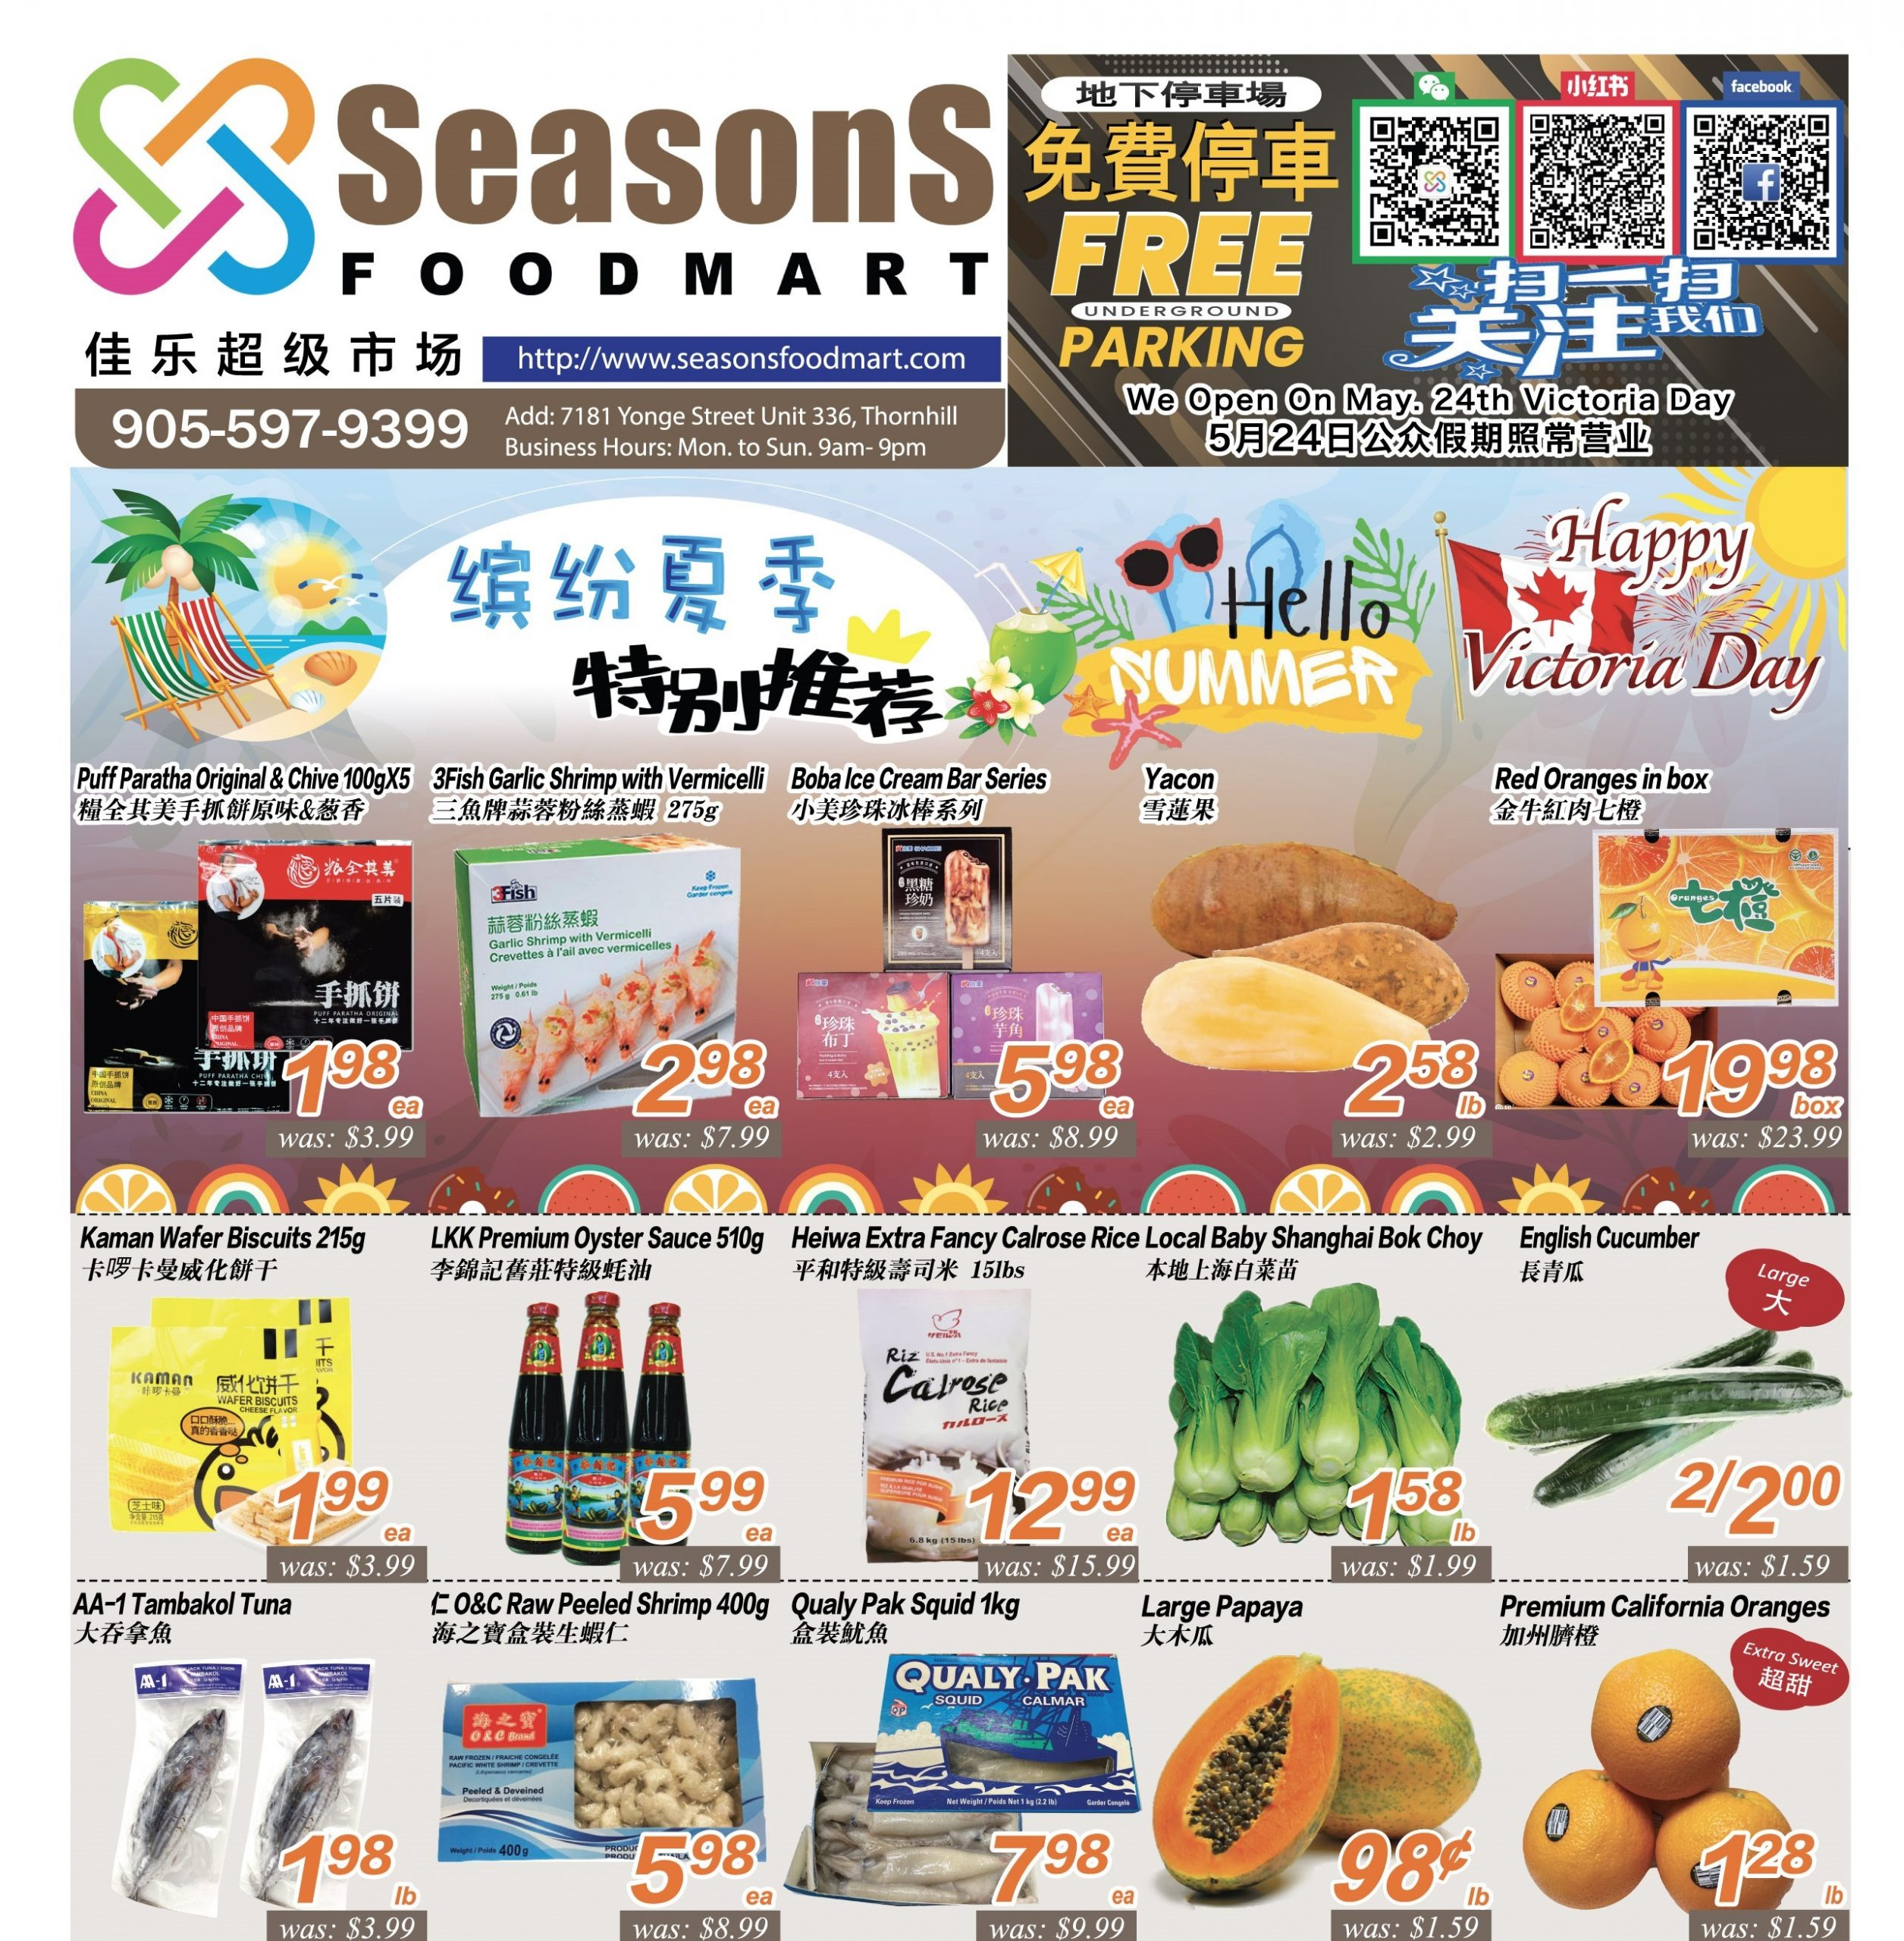 Seasons Foodmart Flyer May 21